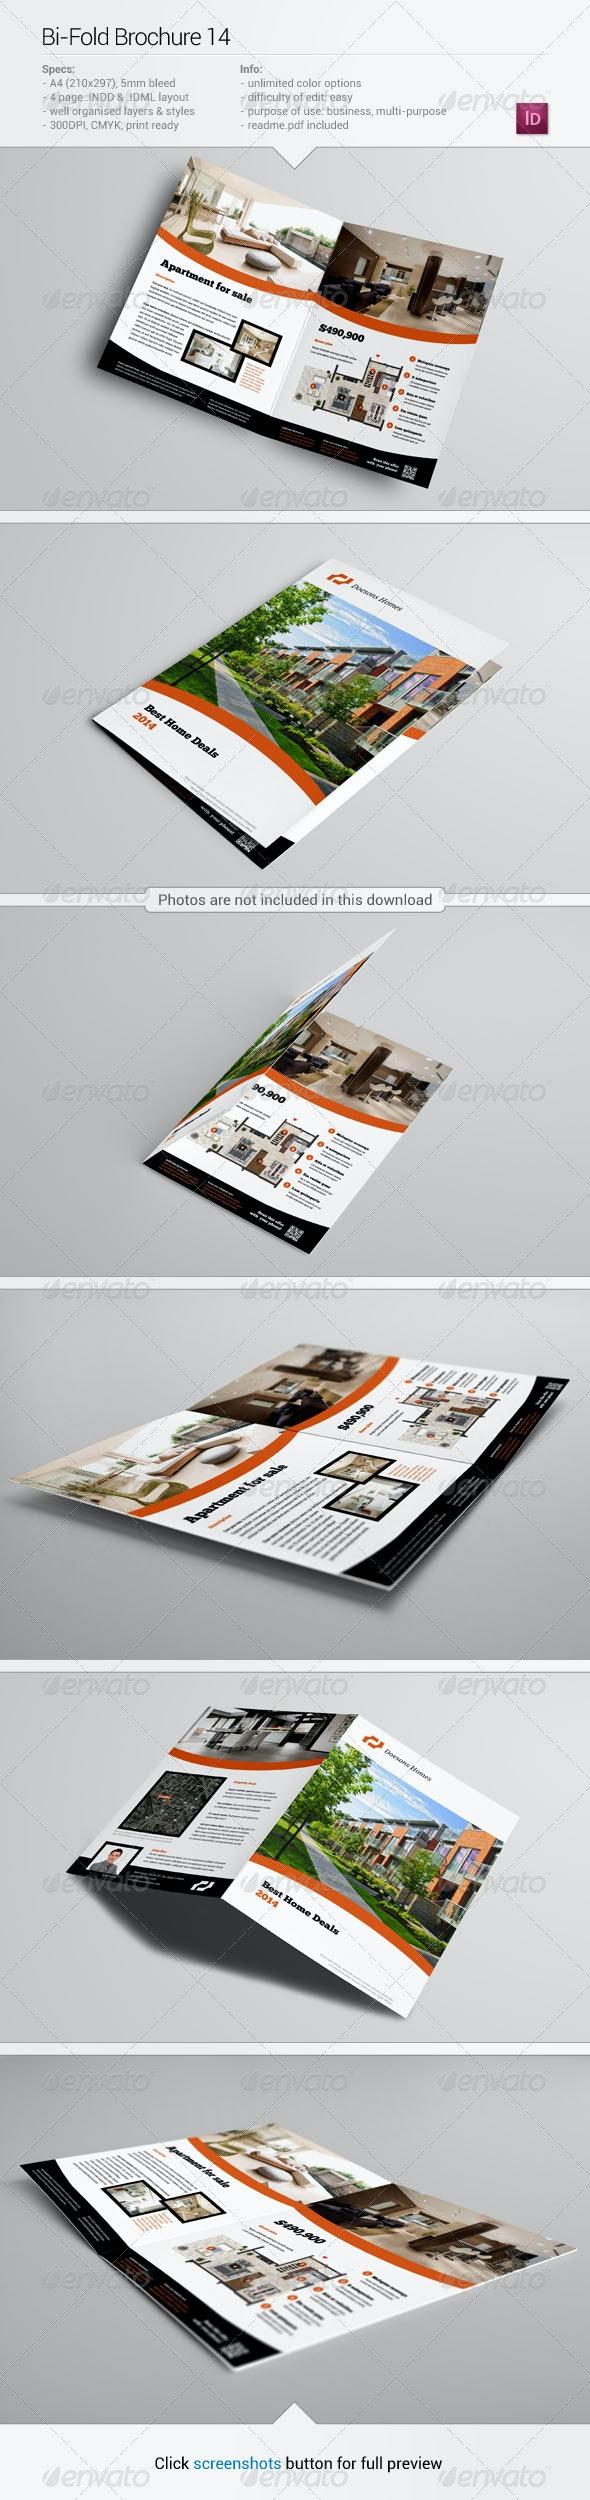 Bi-Fold Brochure 14 - Informational Brochures